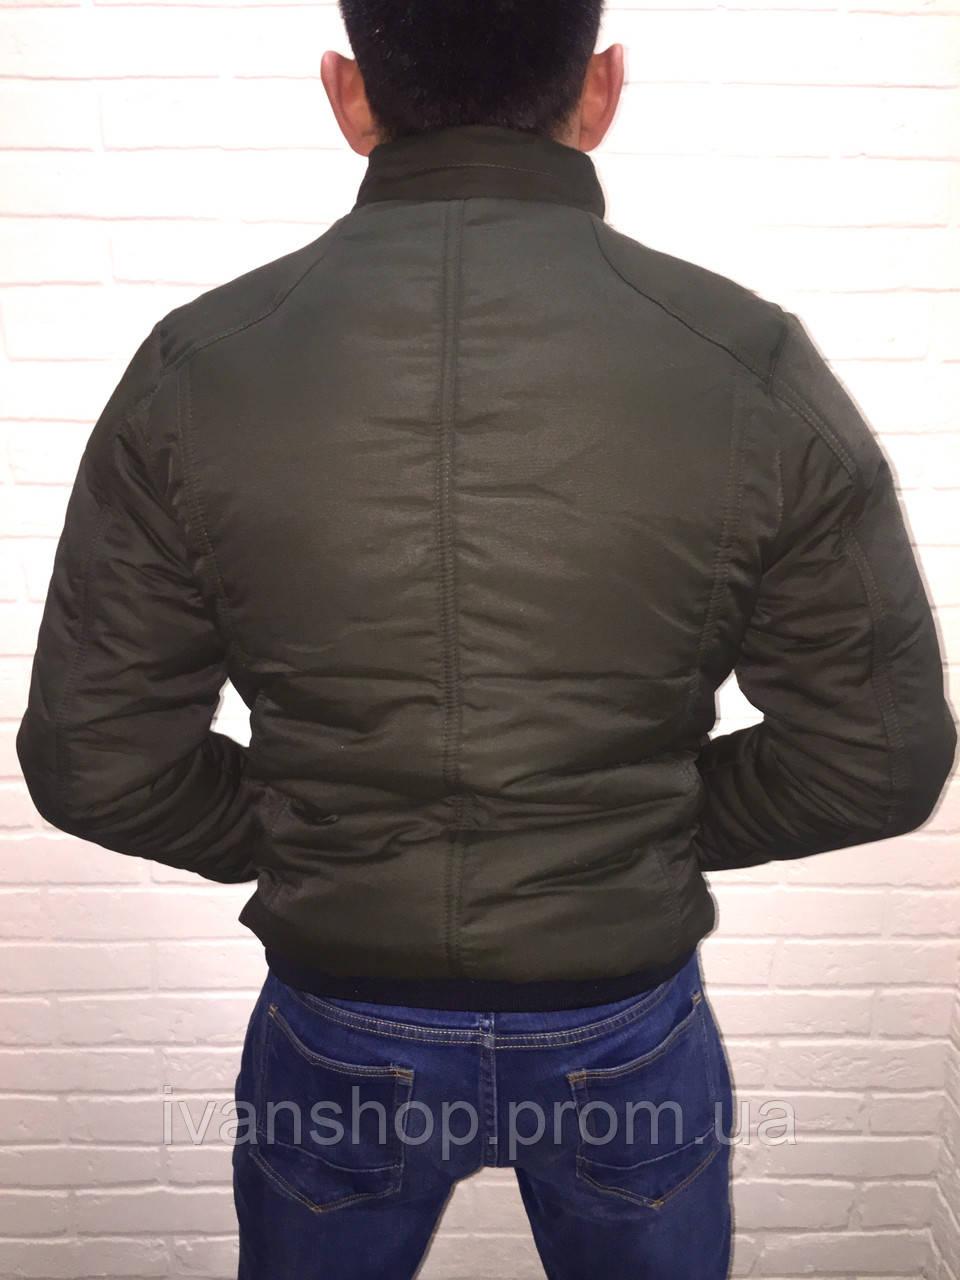 a679ab55bd0 Мужская куртка осень весна хаки  продажа